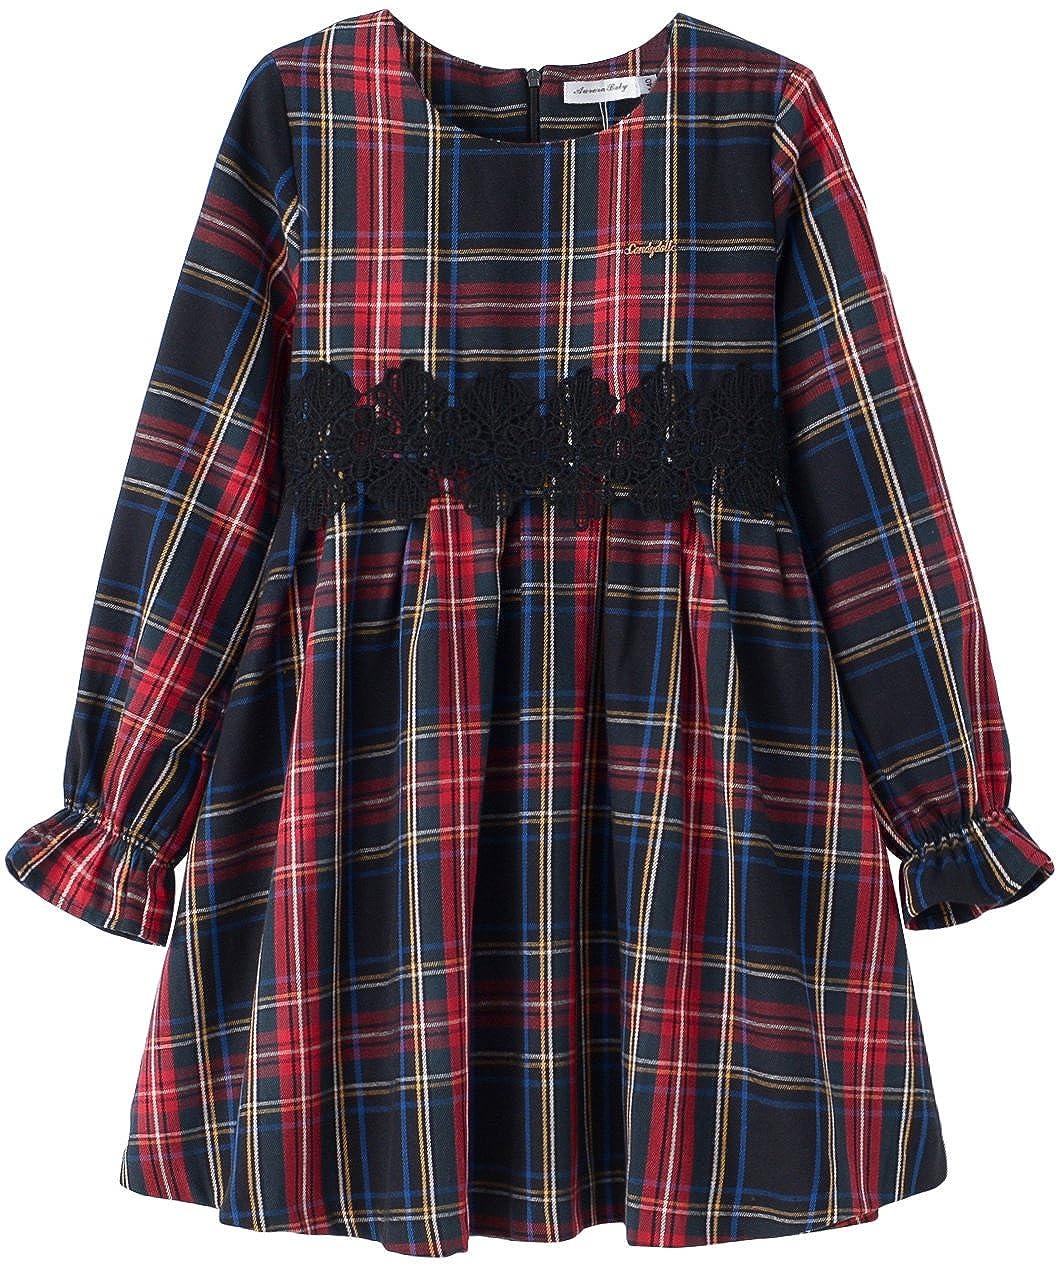 c4be4ae18 Amazon.com: AuroraBaby Toddler Girls Plaid Dresses Long Sleeve Warm Dress  for School Autumn Winter Purple: Clothing